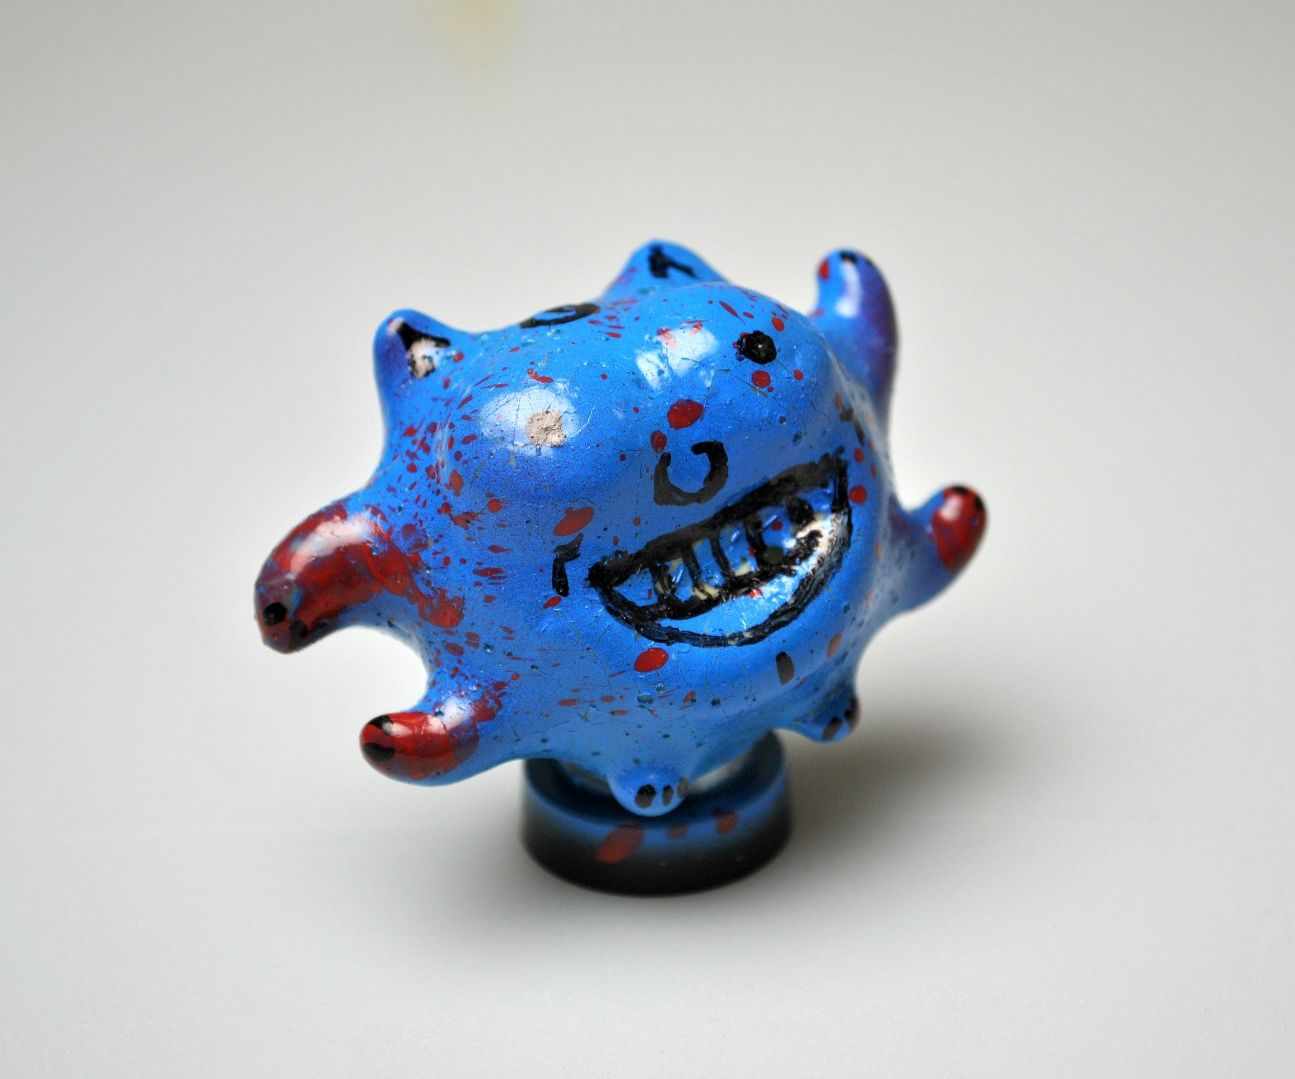 Dip Moulding - Make your own monster